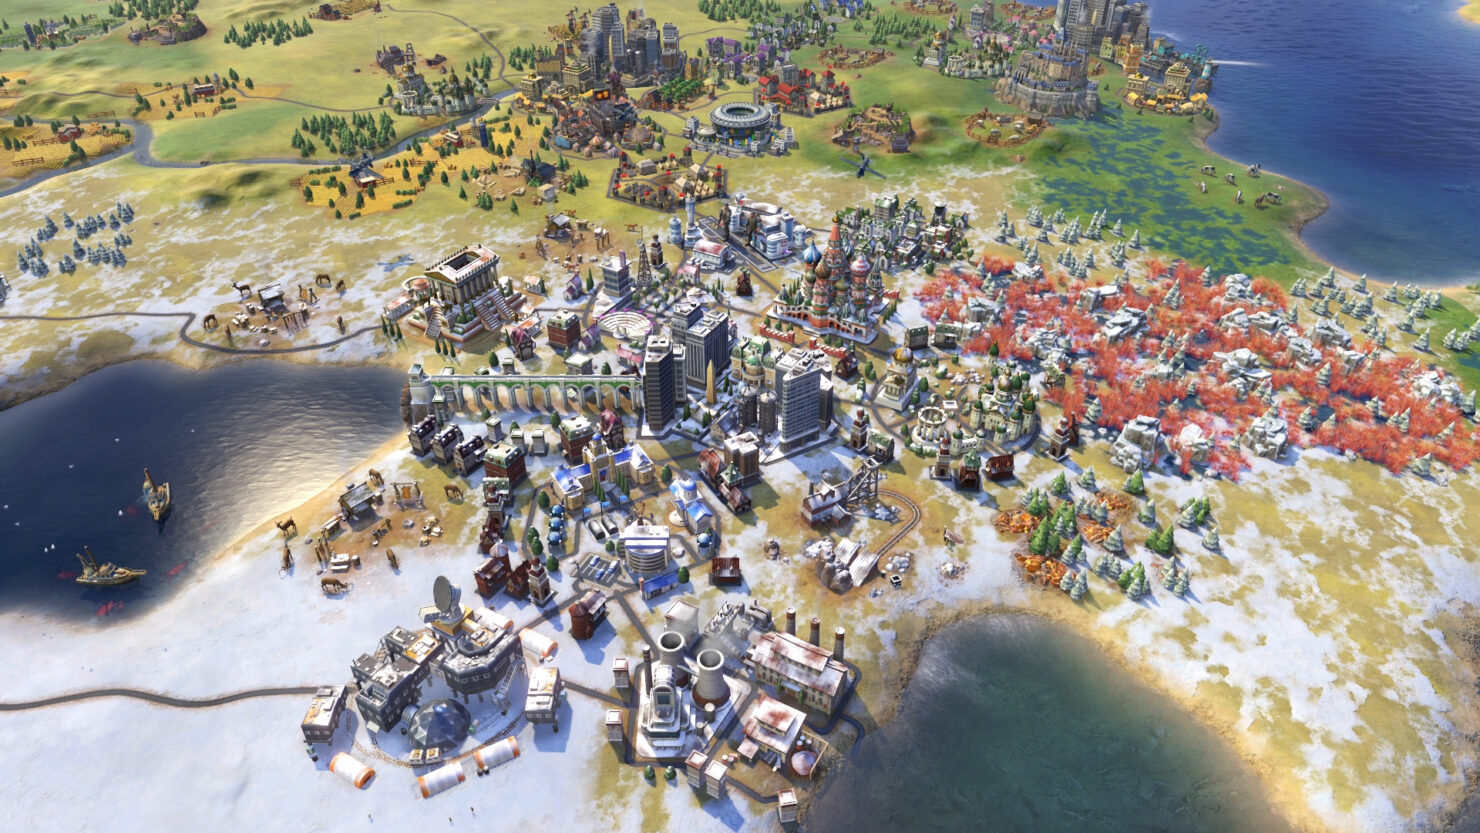 2kgmkt_civilizationvi-rf_game-image_announce_tundra_1